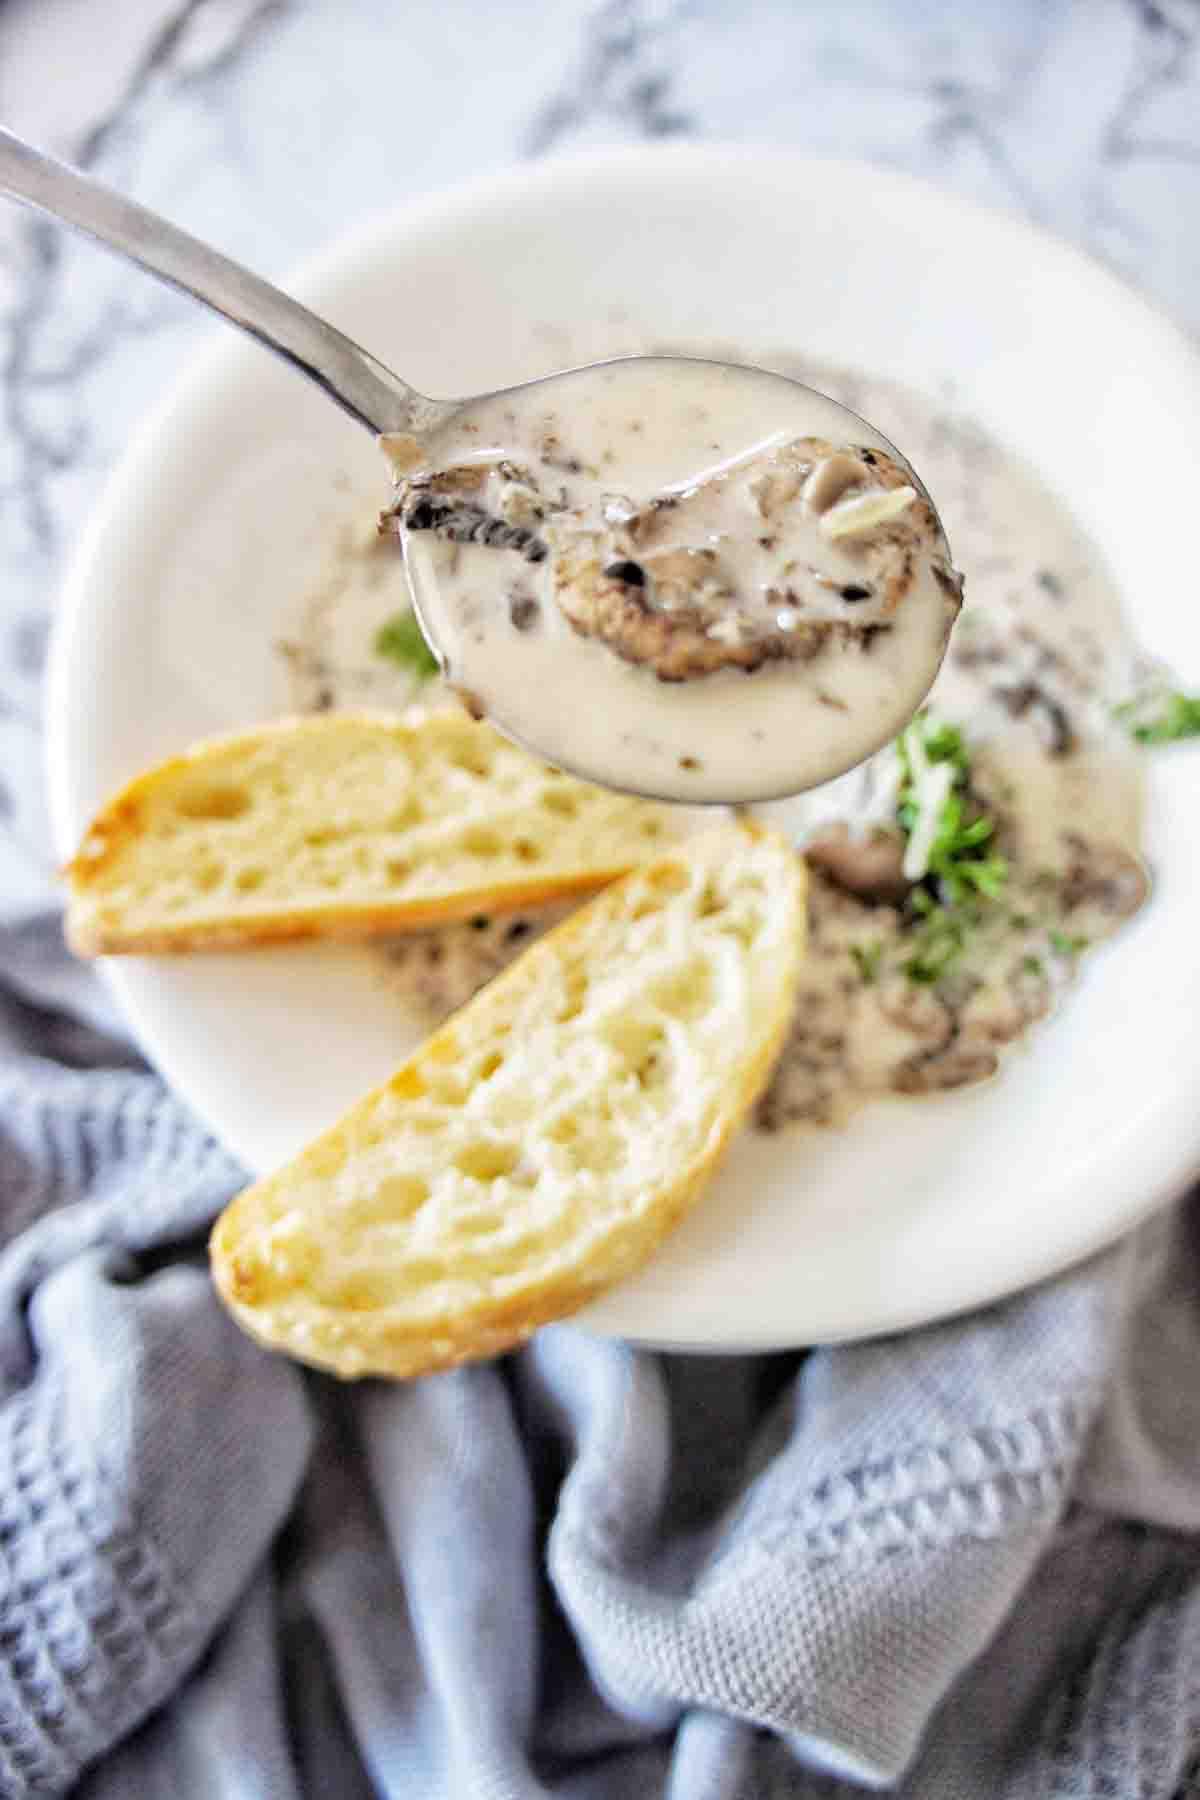 Spoon of mushroom soup held above bowl of same